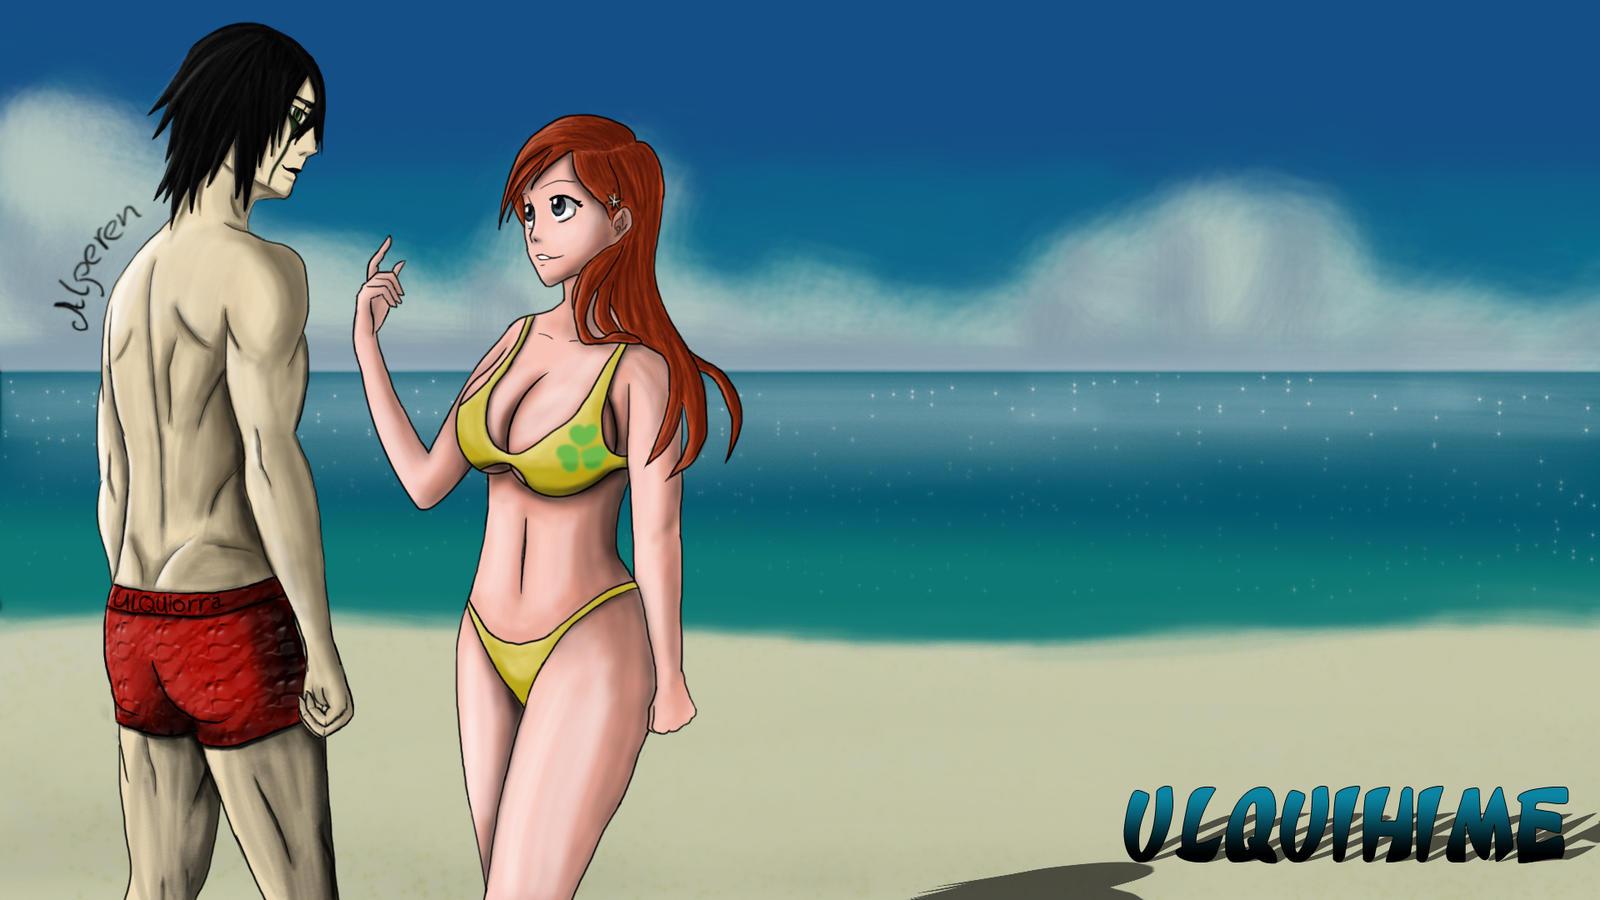 Ulquihime on the Beach by DOGGMAFFIA